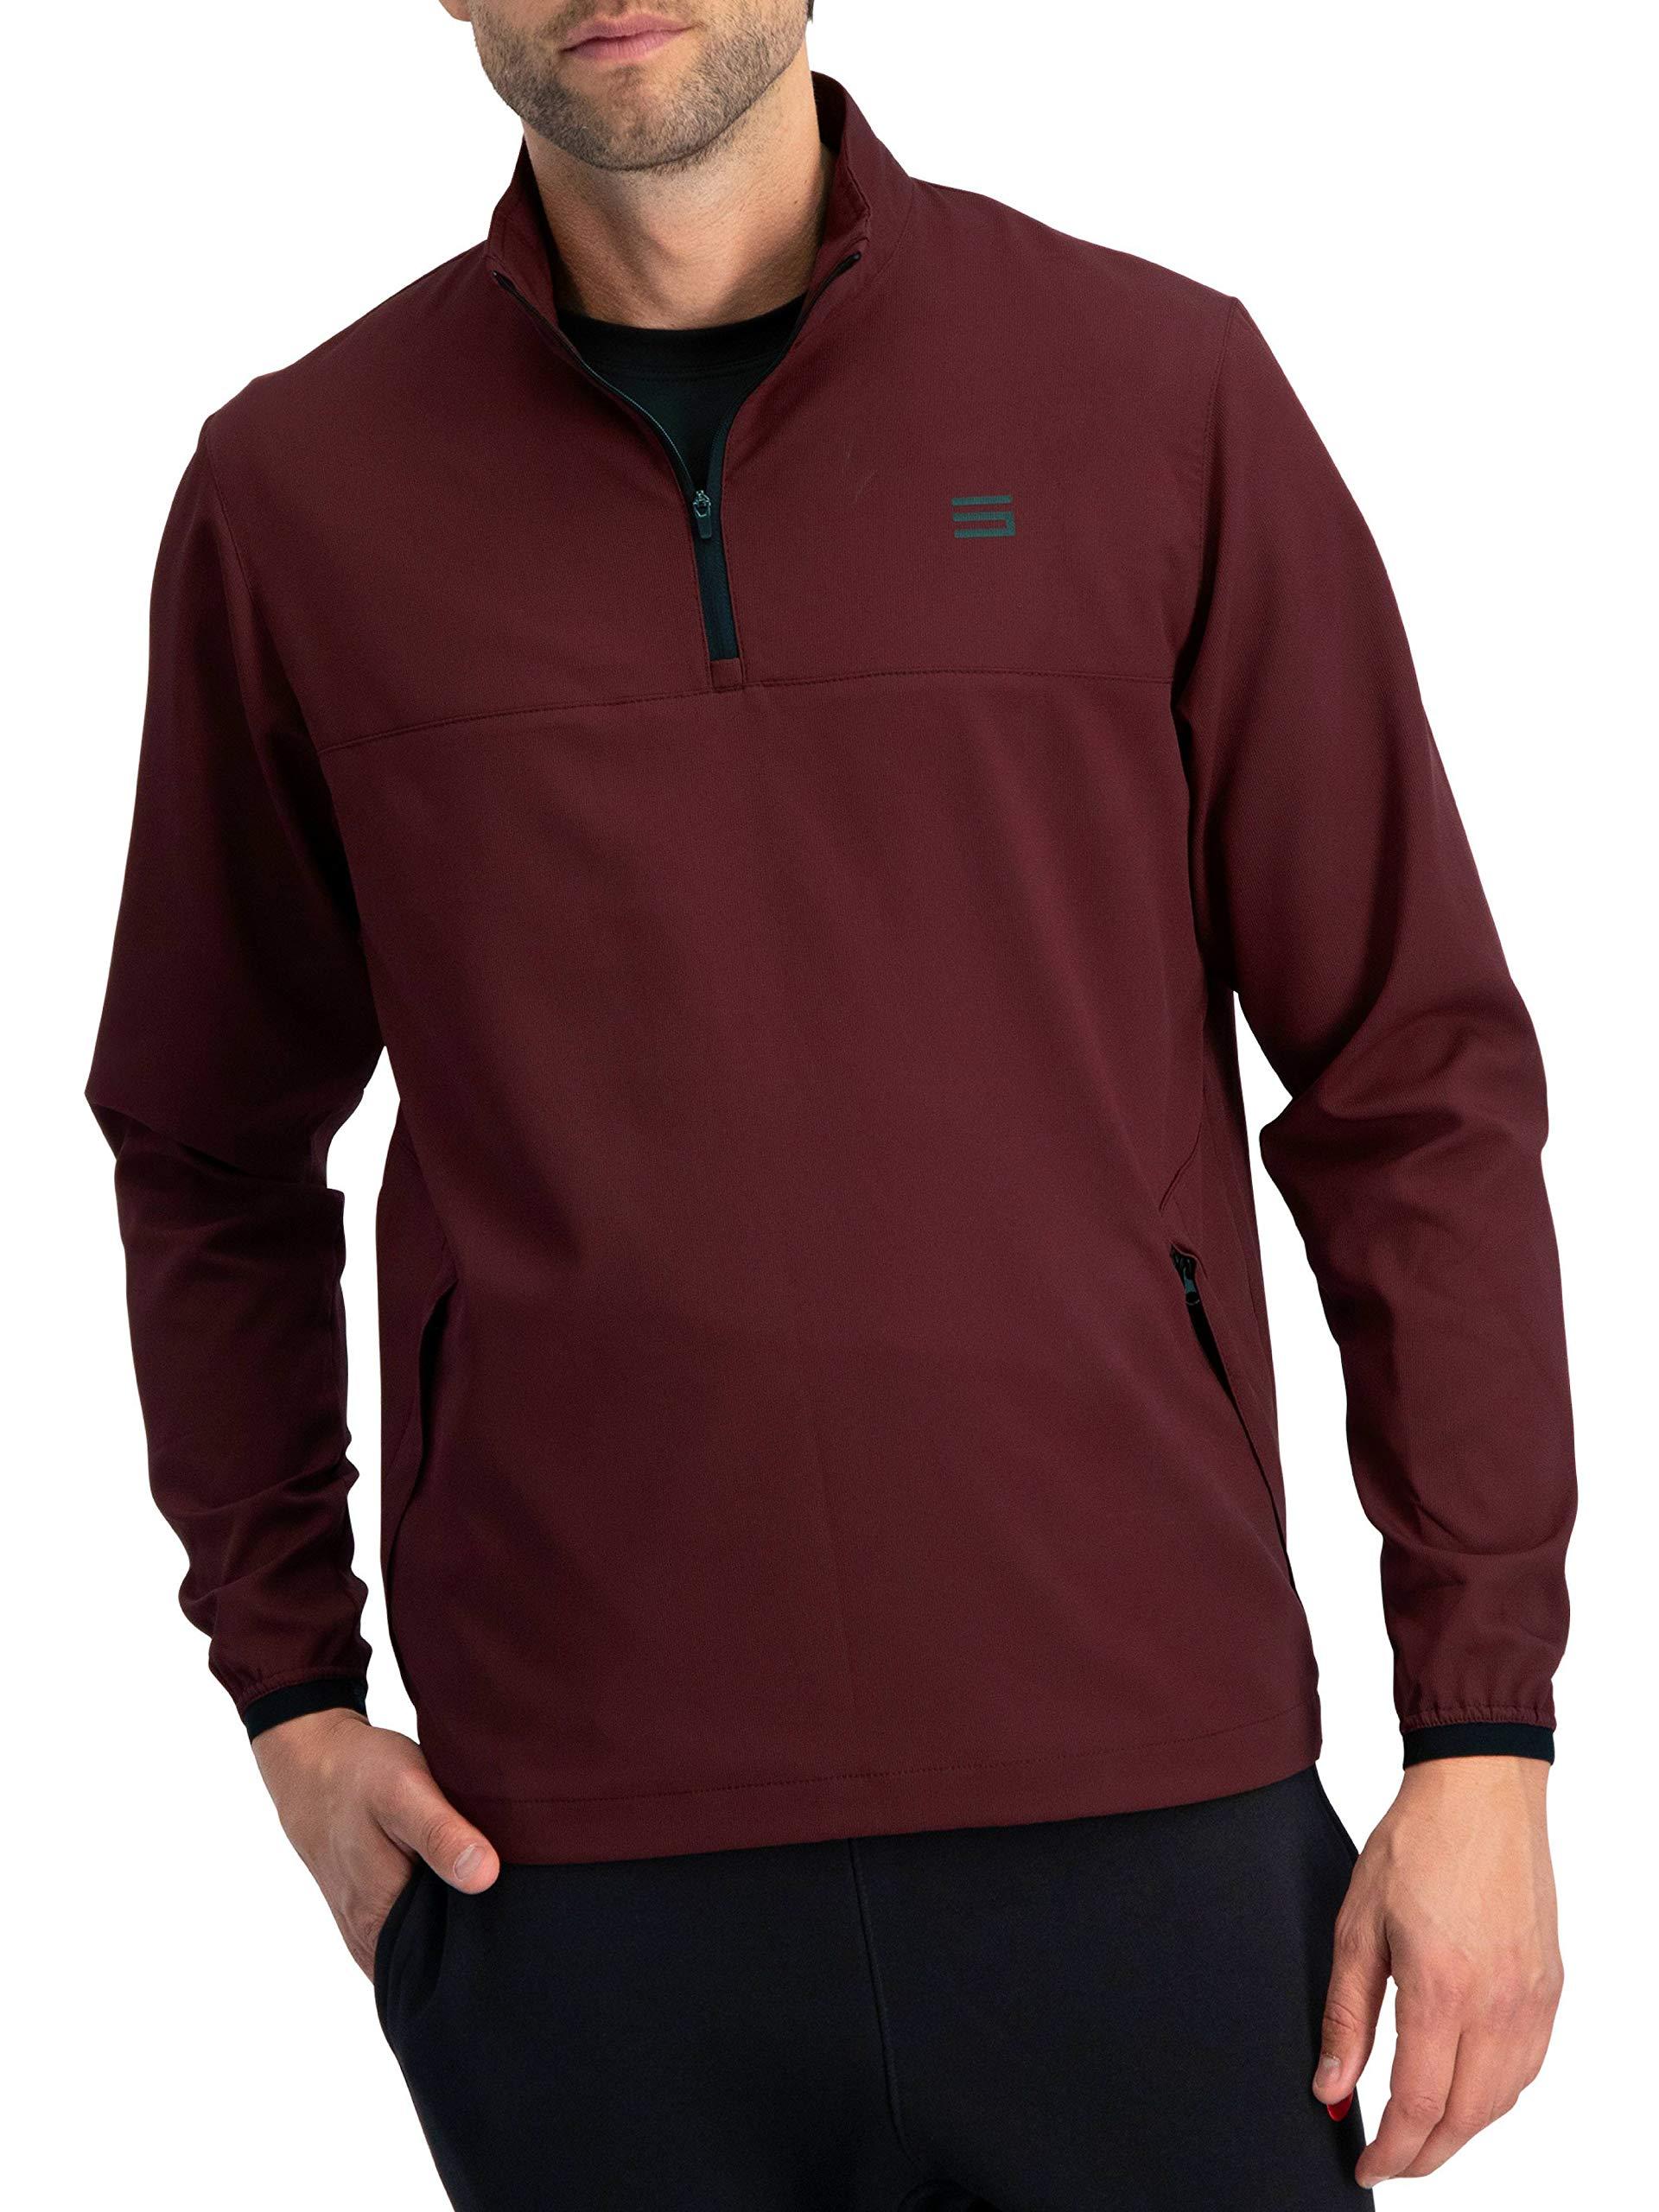 Mens Windbreaker Jackets - Half Zip Golf Pullover Wind Jacket - Vented, Dry Fit Dark Burgundy by Three Sixty Six